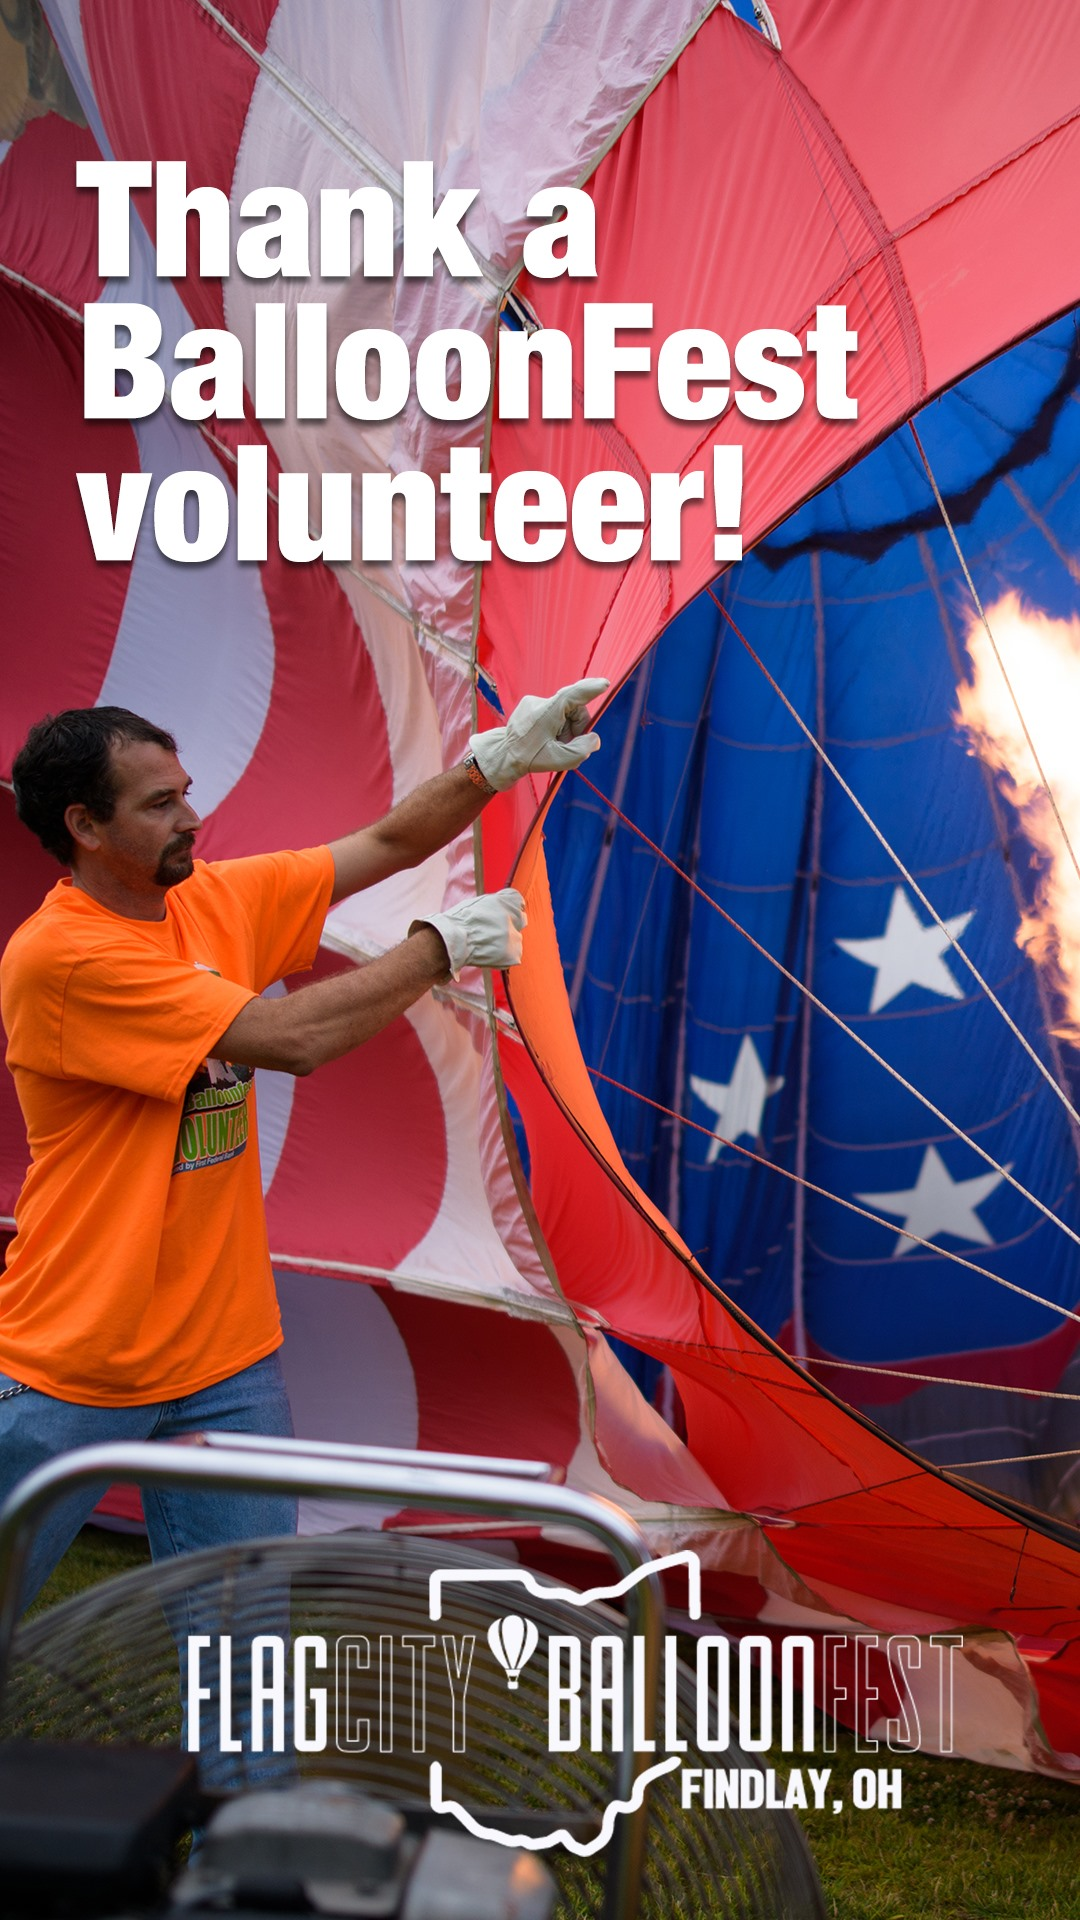 BalloonFest Volunteer Ad